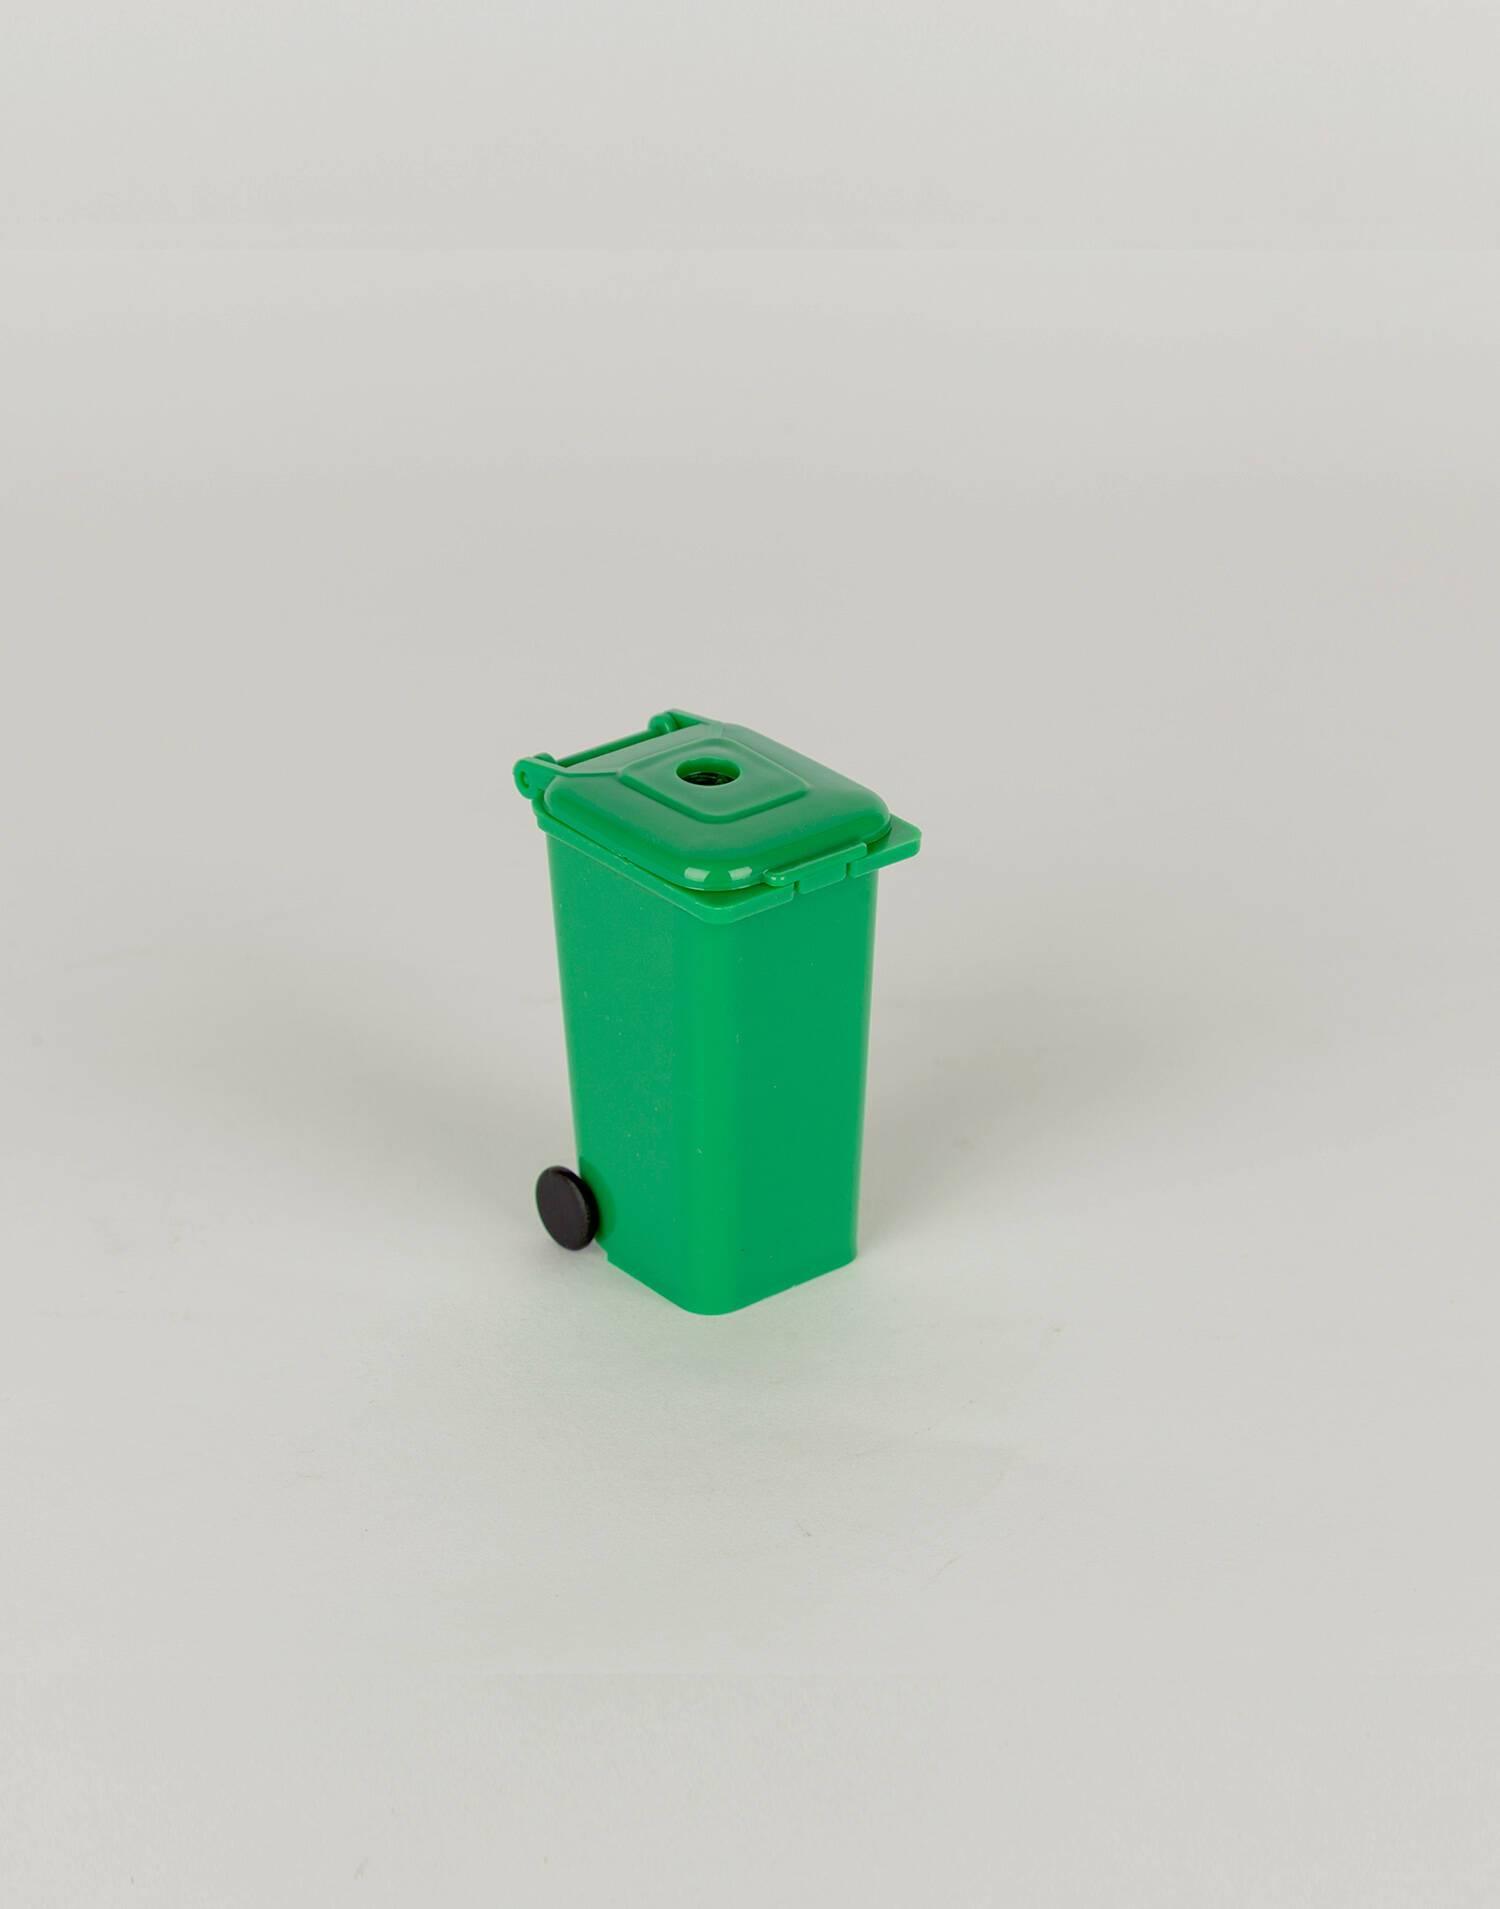 Trash can pencil sharpener